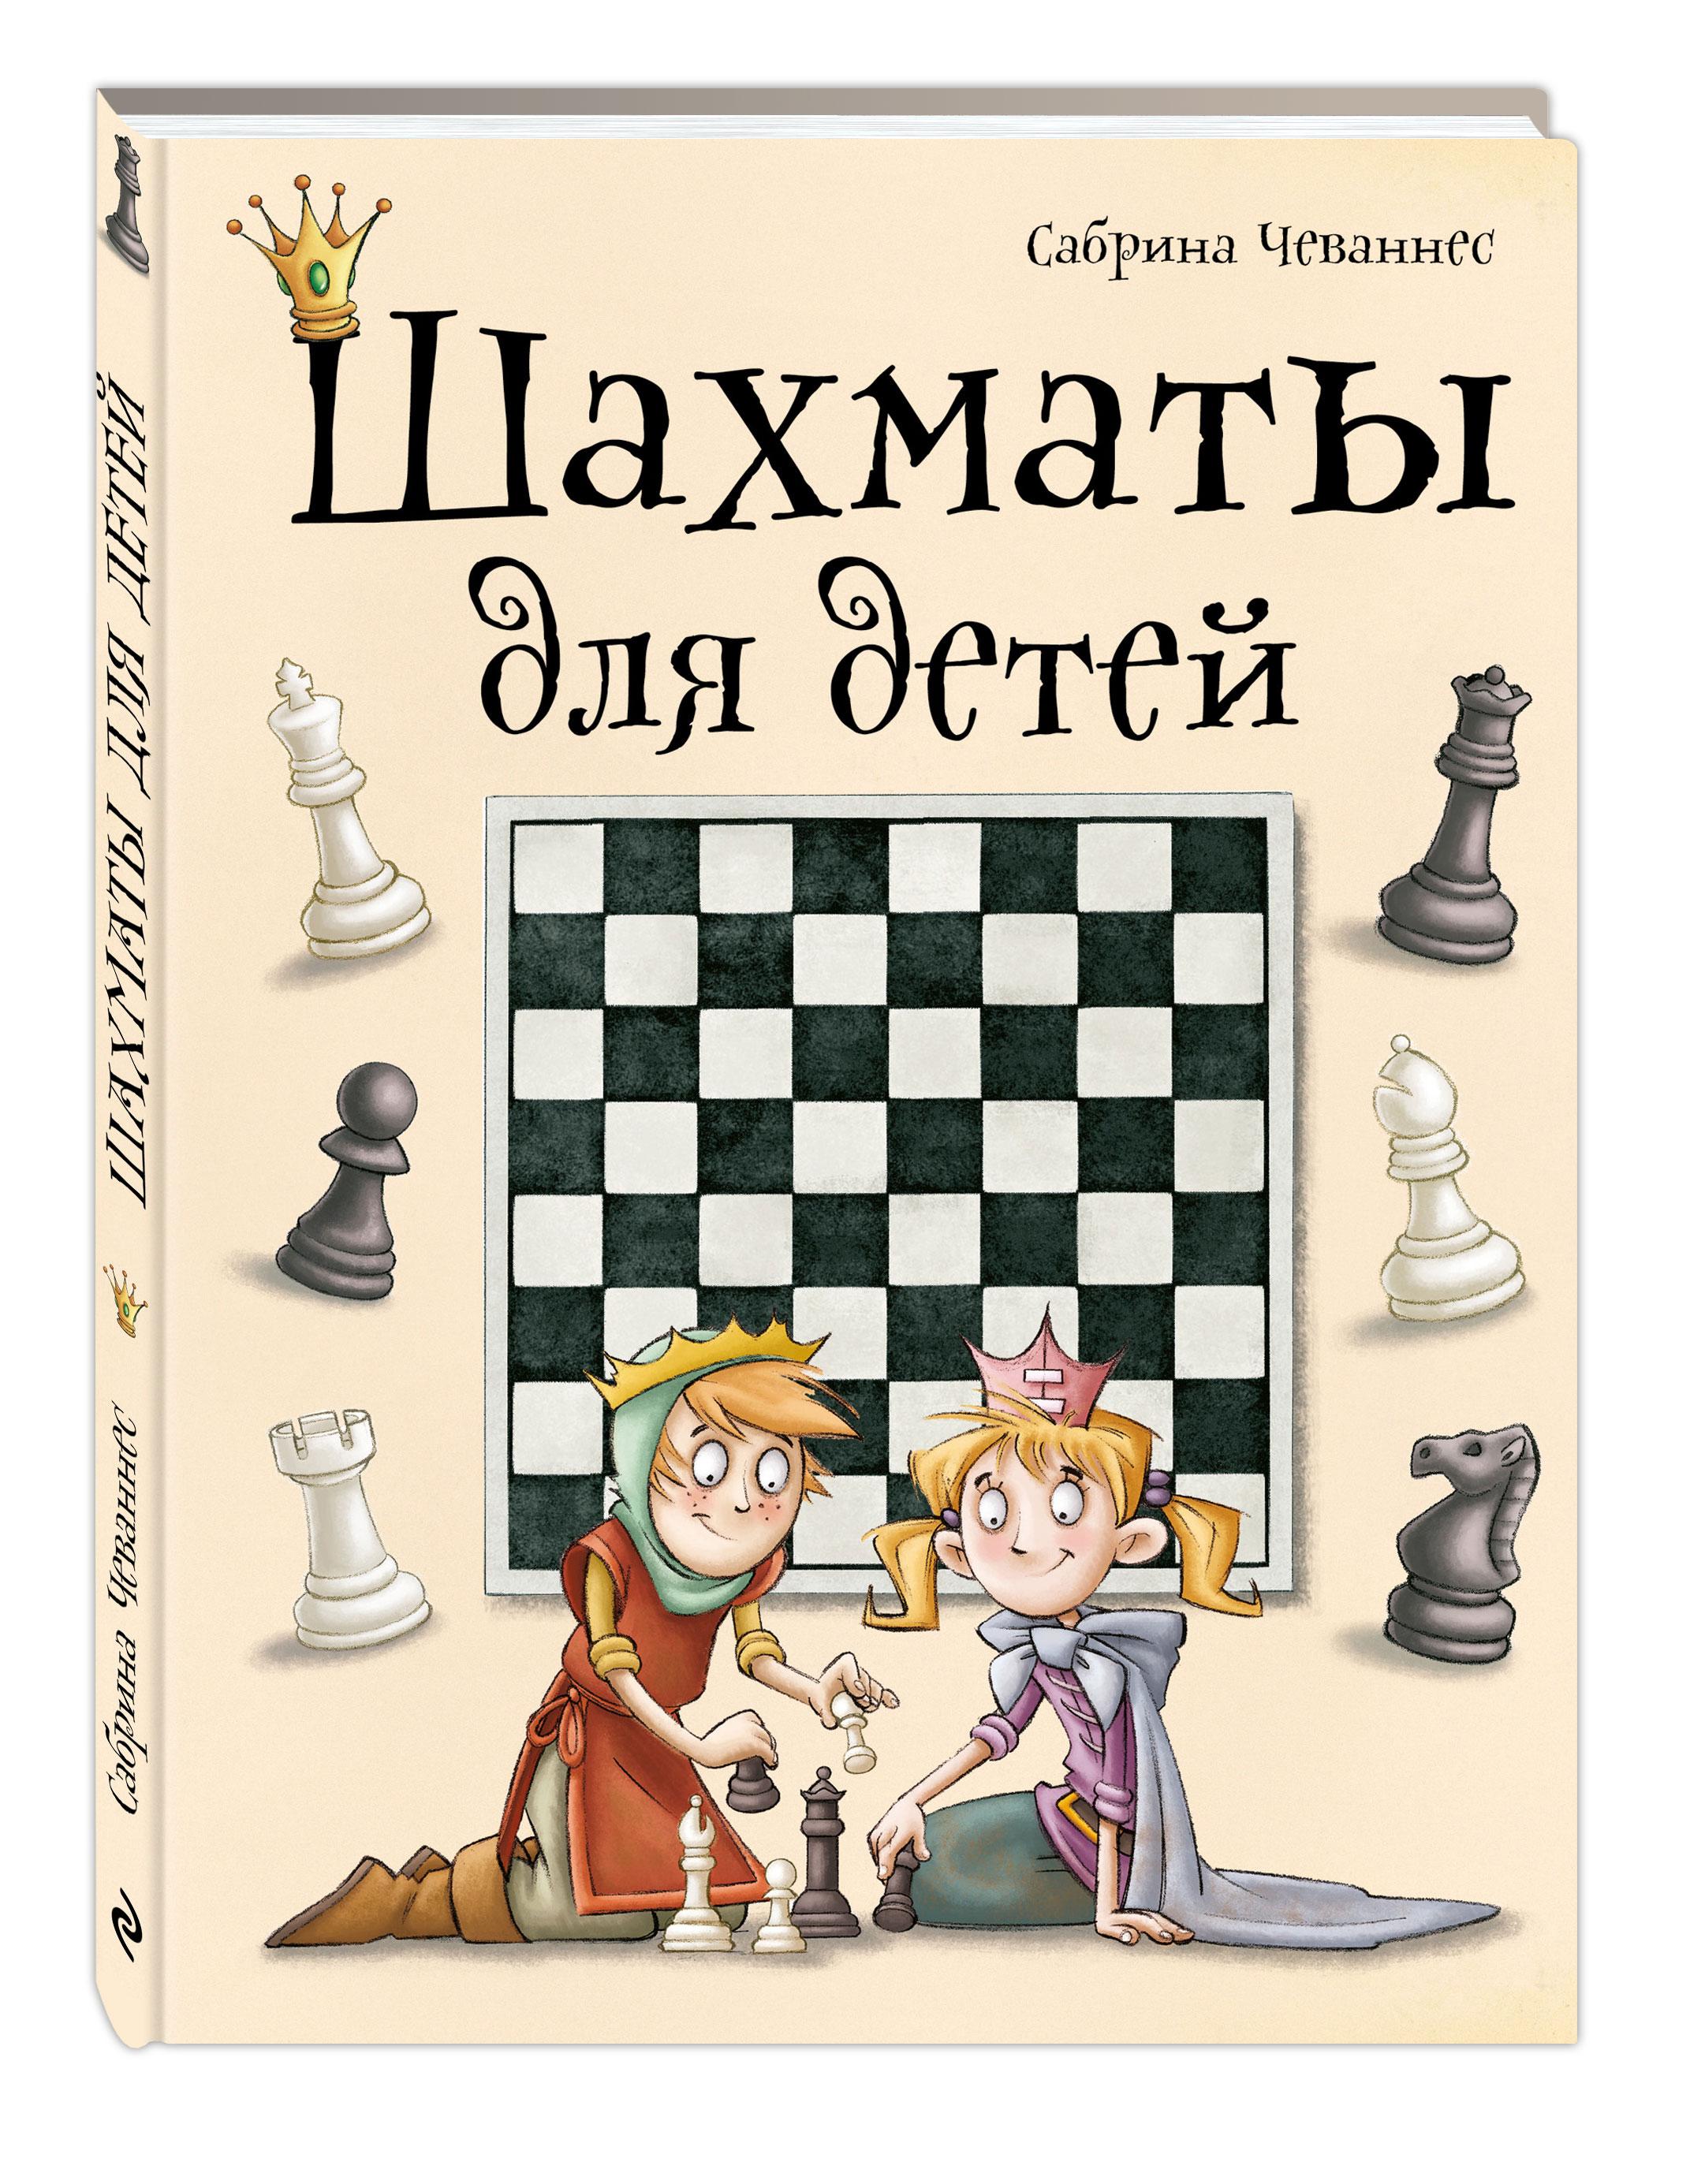 Шахматы для детей ( Чеваннес С.  )